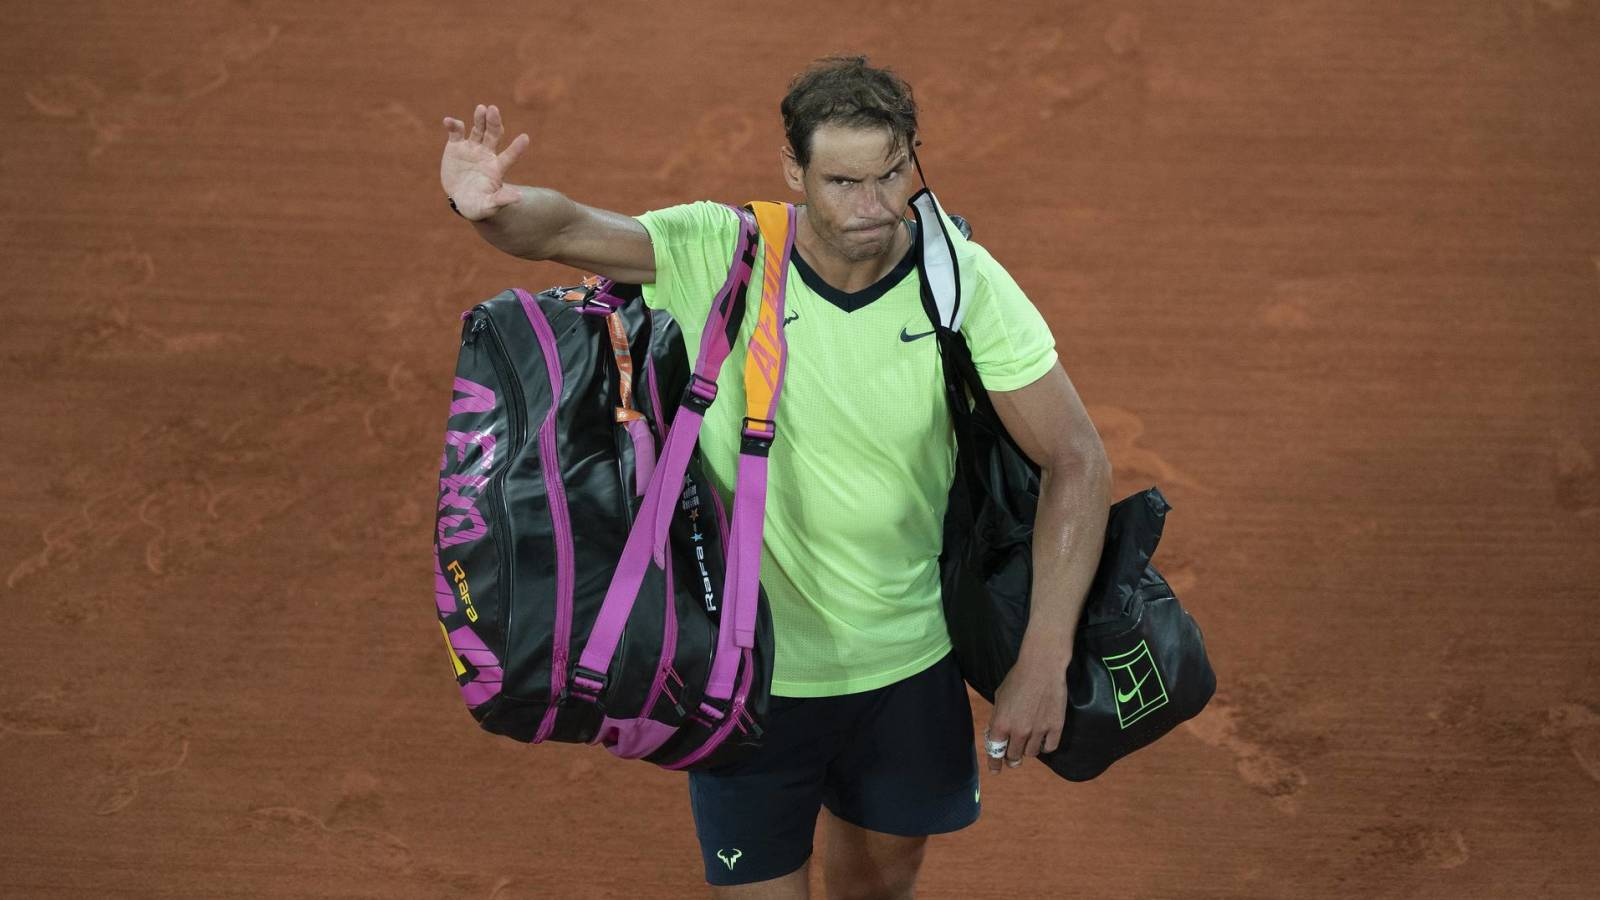 Rafael Nadal will not play at Wimbledon or the Tokyo Olympics